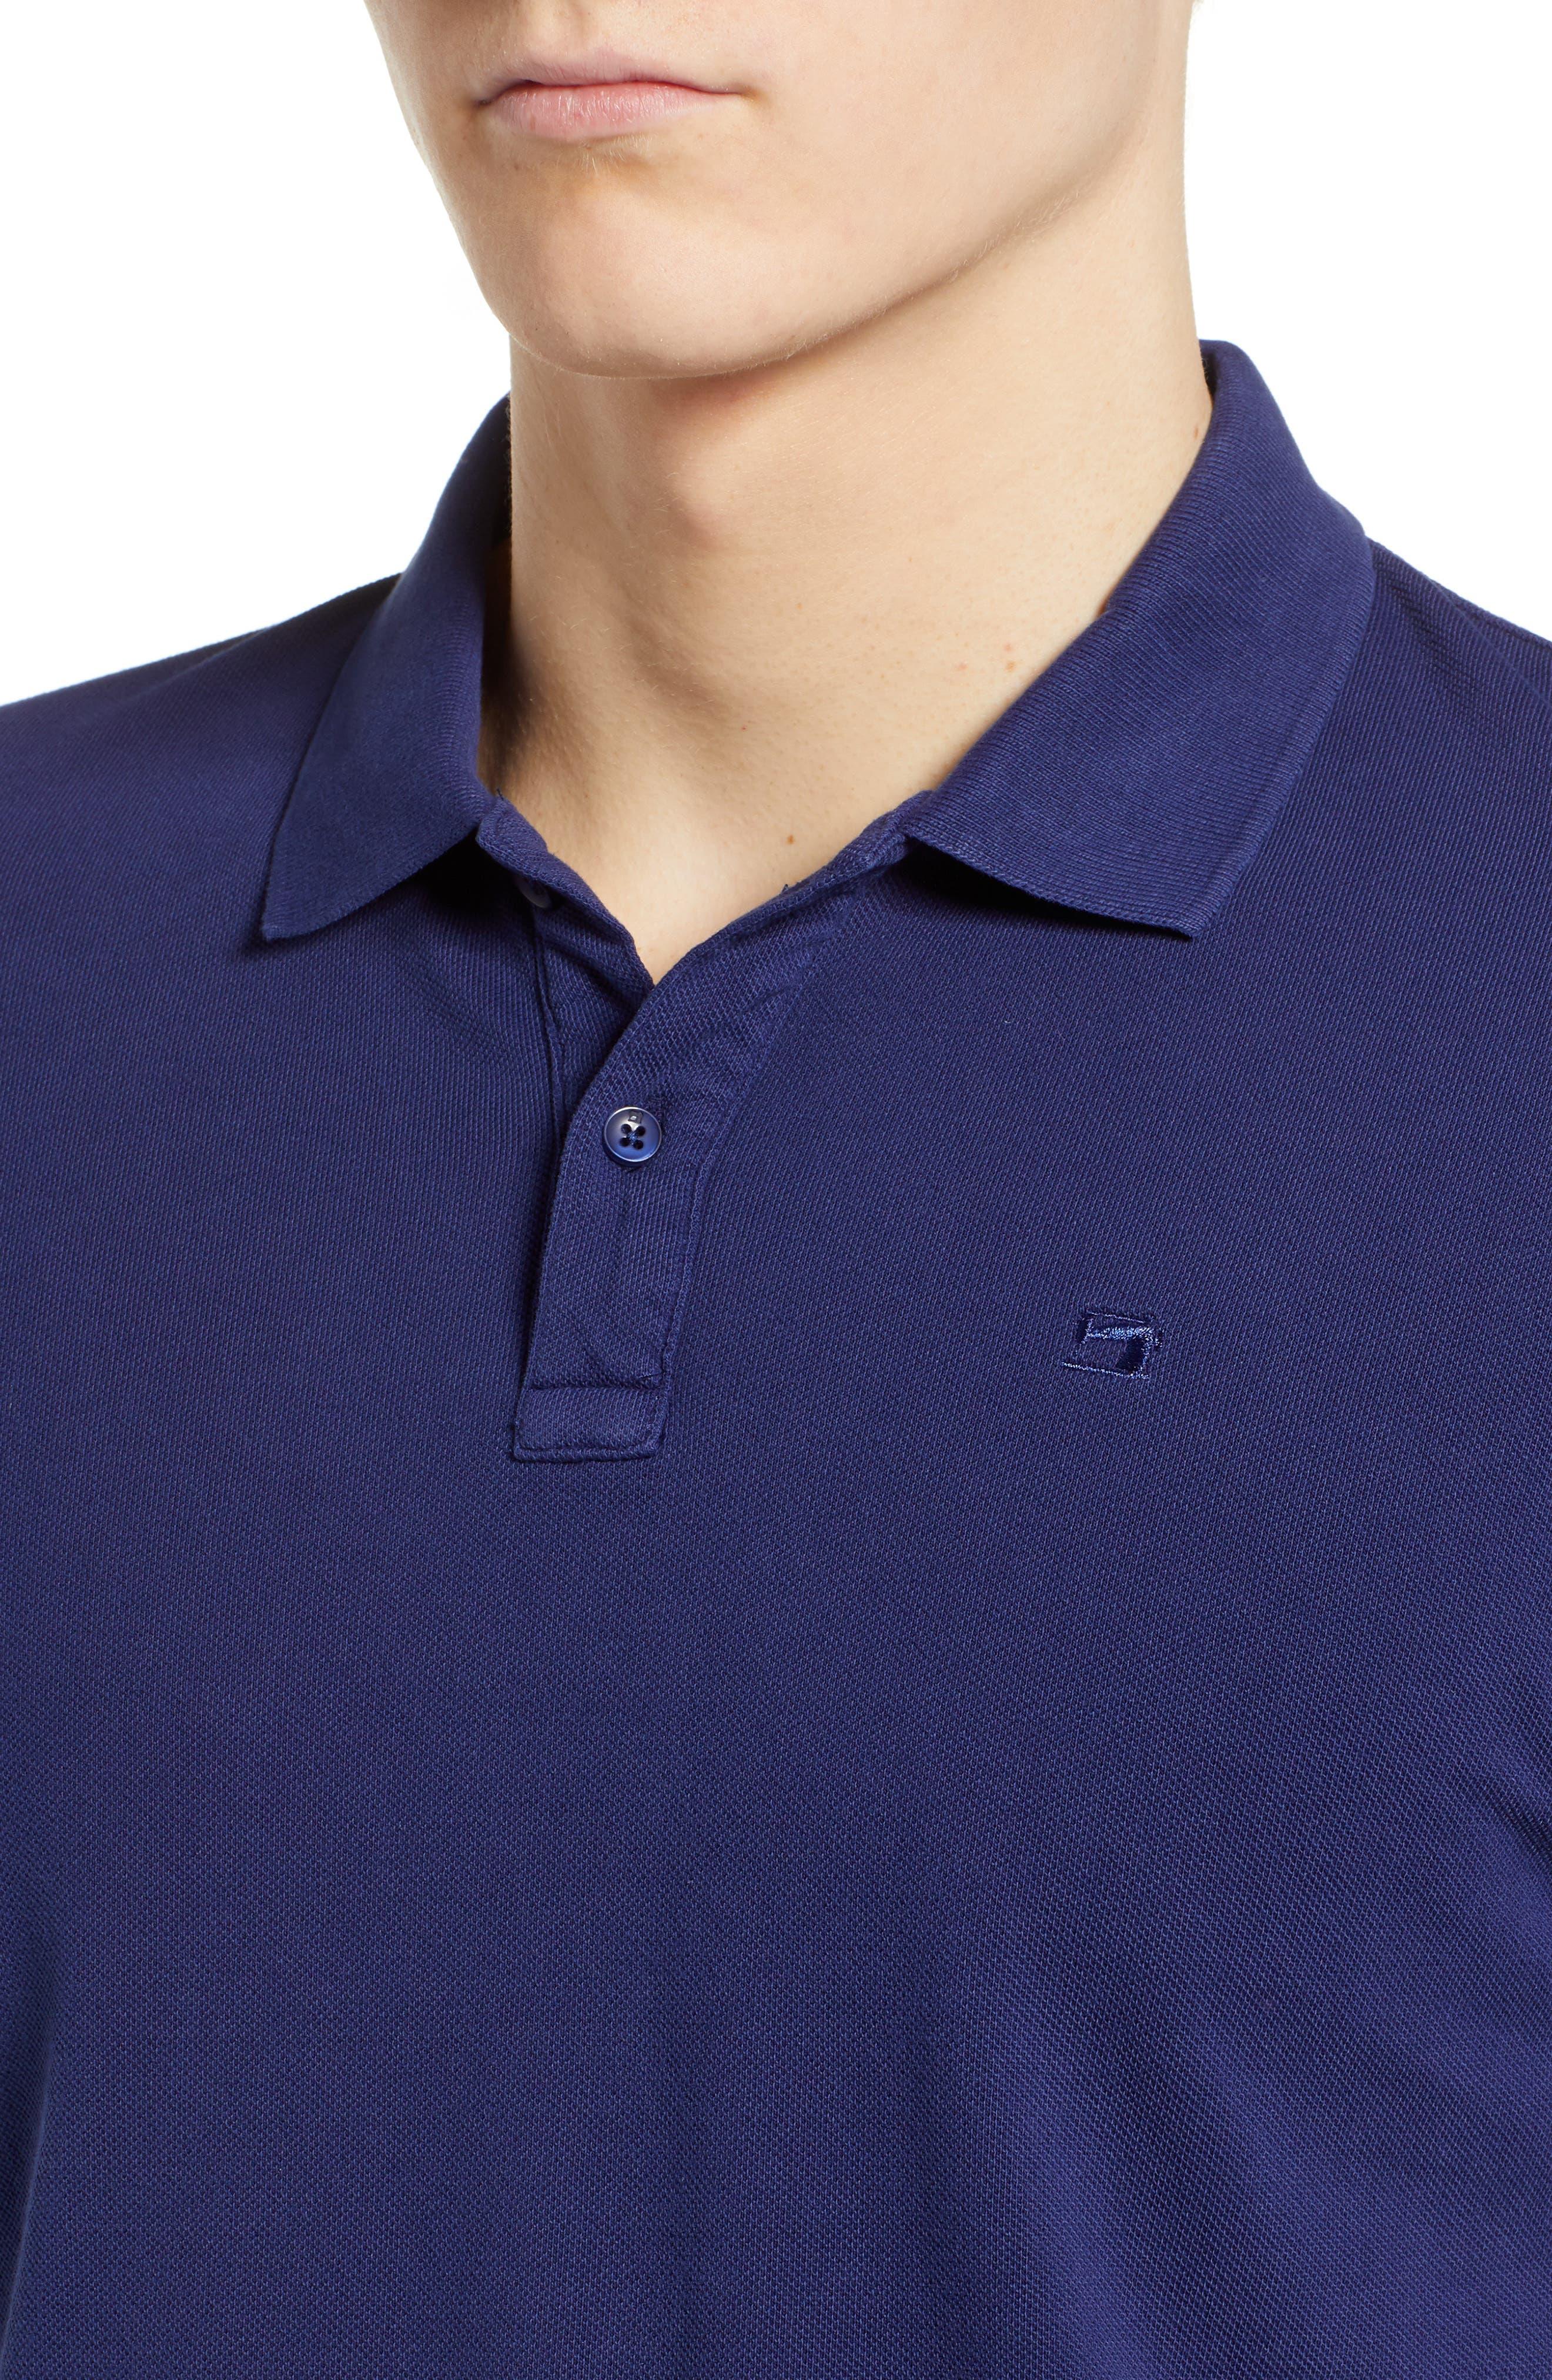 Garment Dyed Piqué Polo,                             Alternate thumbnail 4, color,                             410